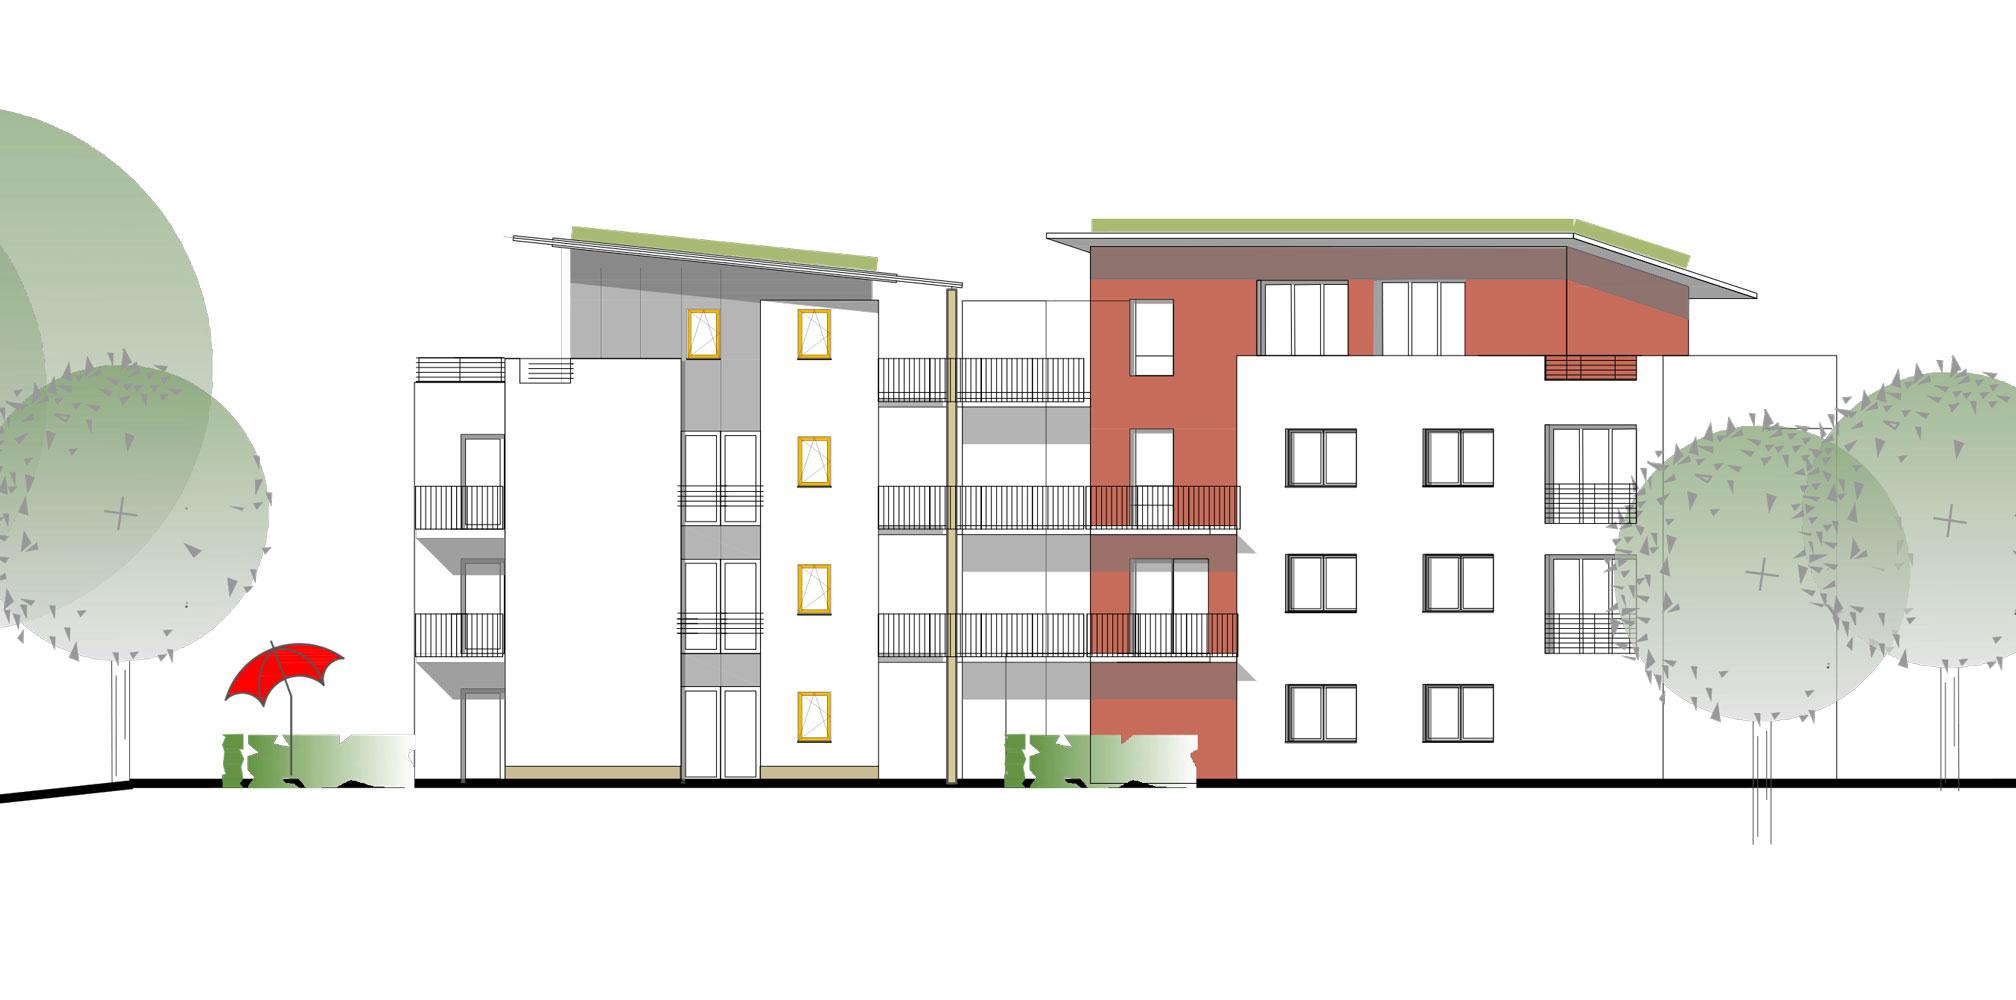 Wohnprojekt am Lennhofe Dortmund-Menglinghausen, Planquadrat Dortmund